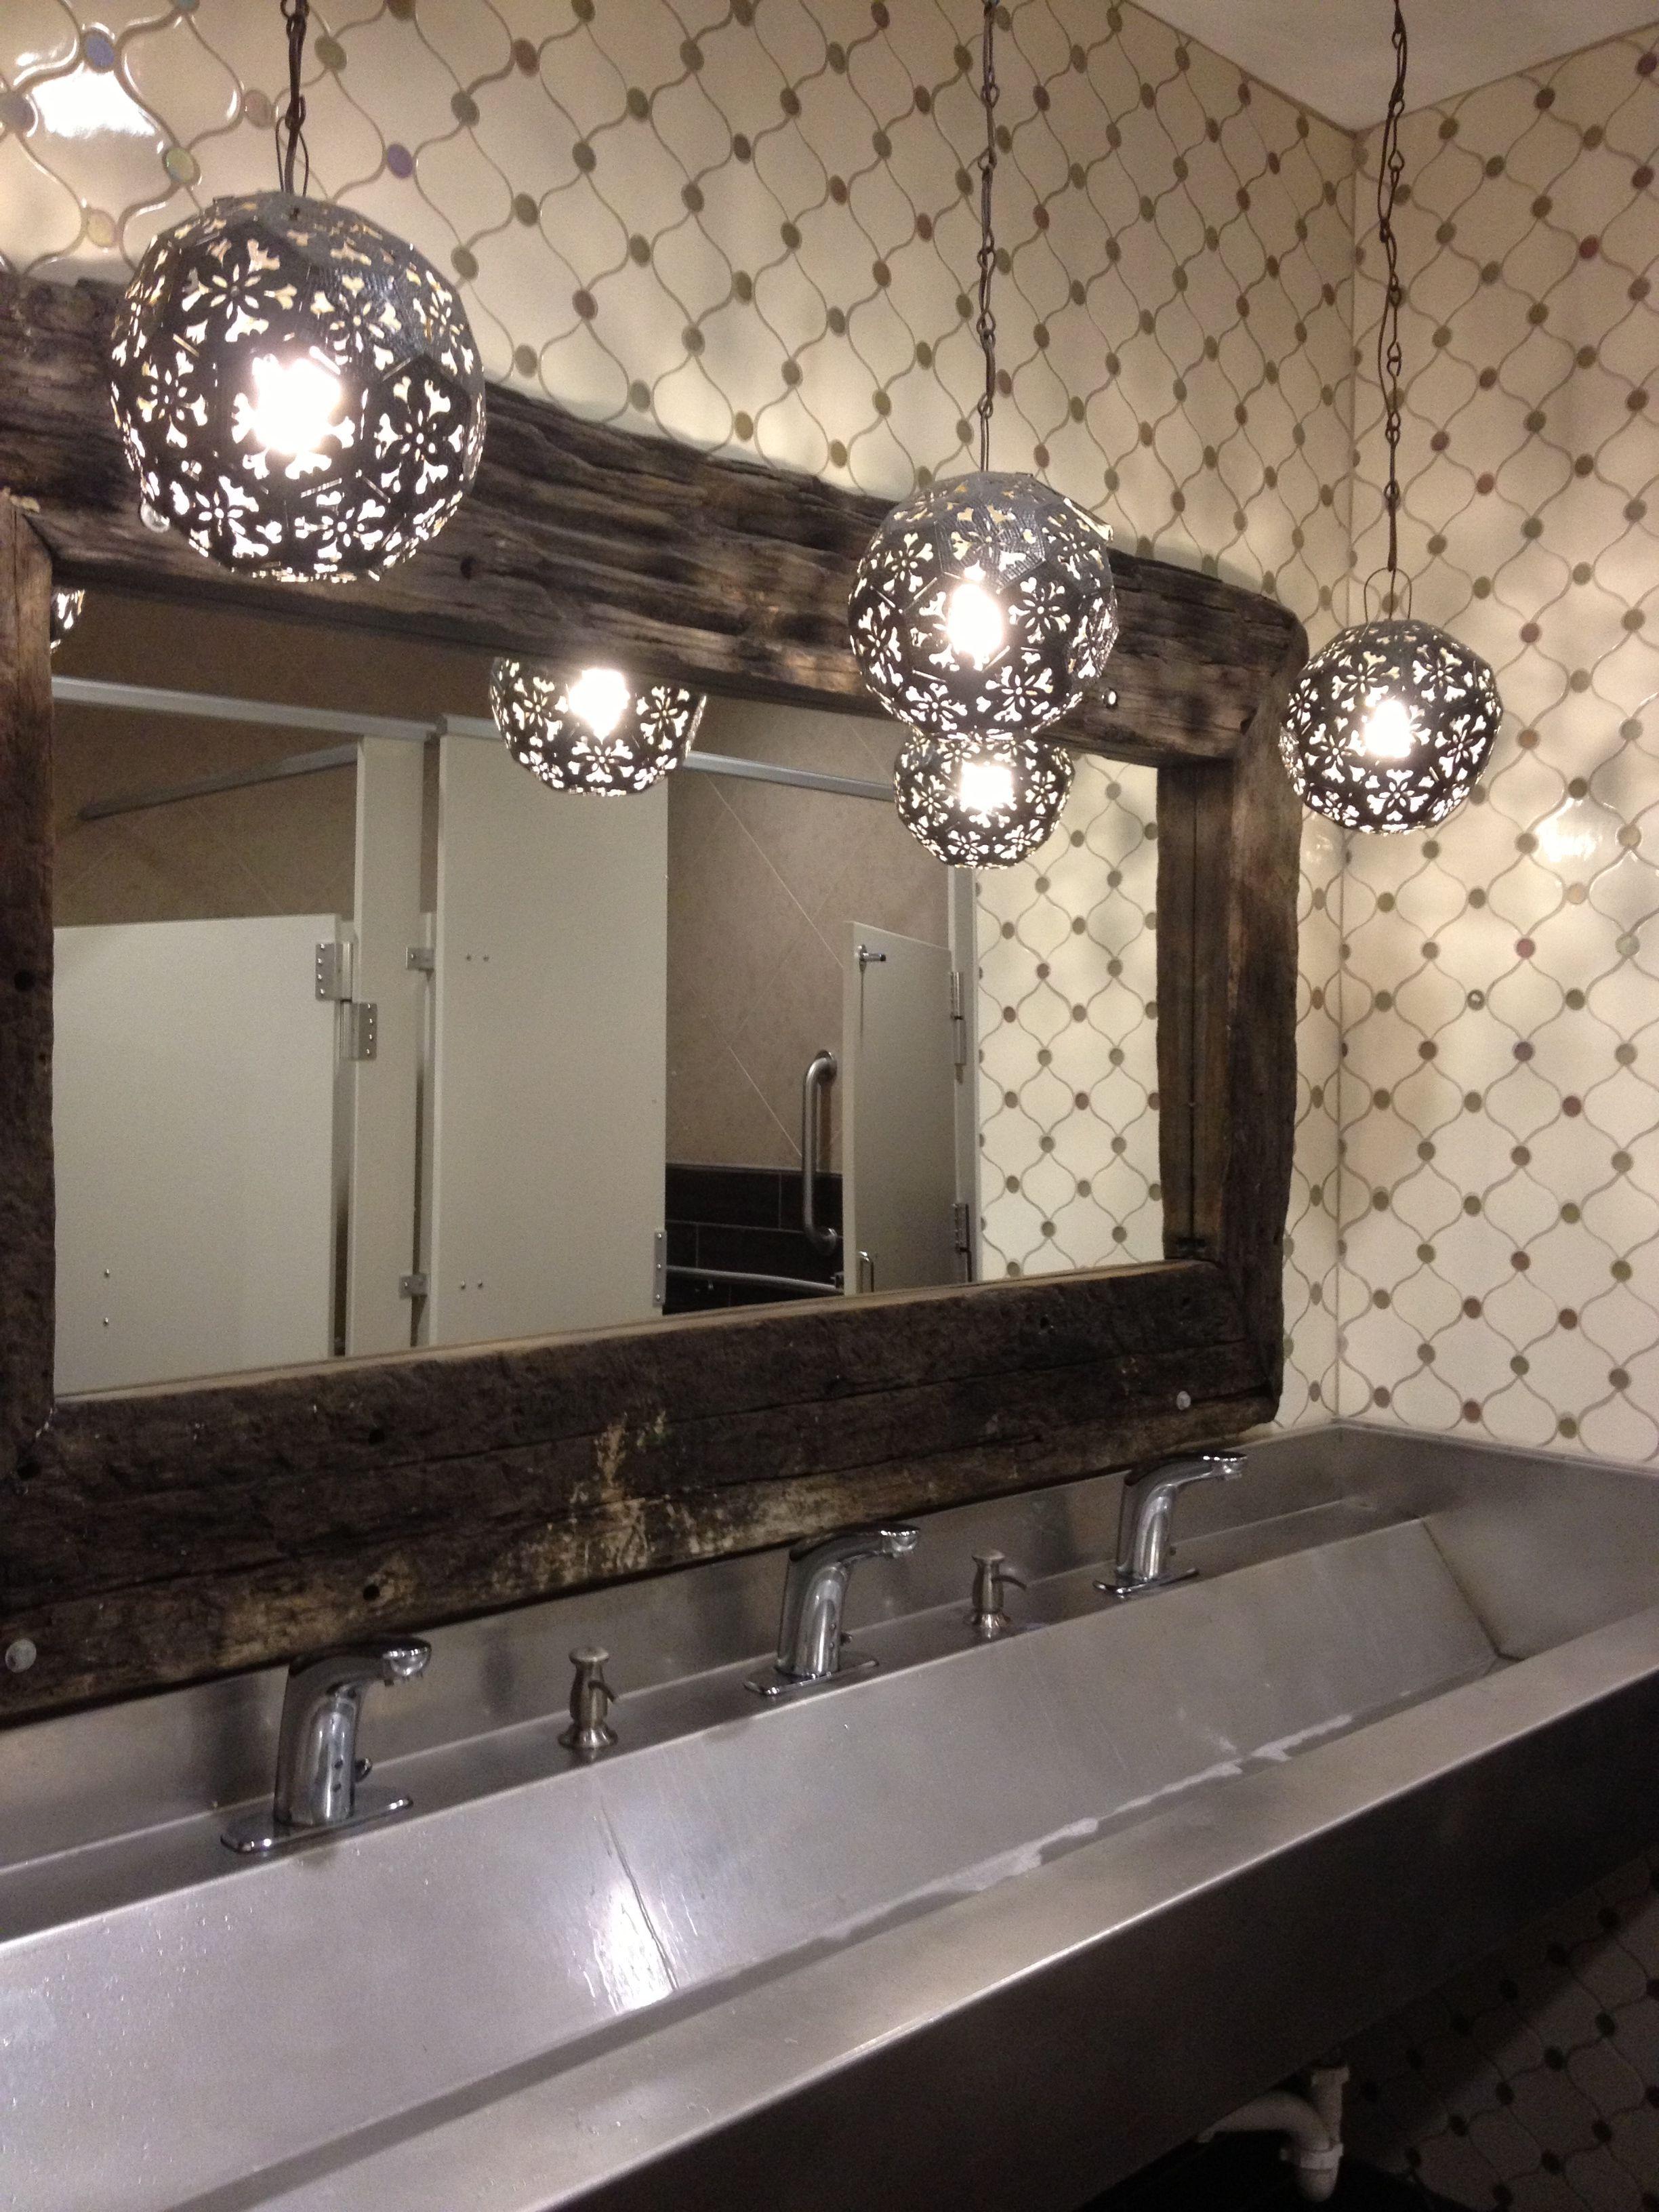 Pin By Suzi Q On Bathroom 3 Amazing Bathrooms Bathroom Light Fixtures Elegant Bathroom